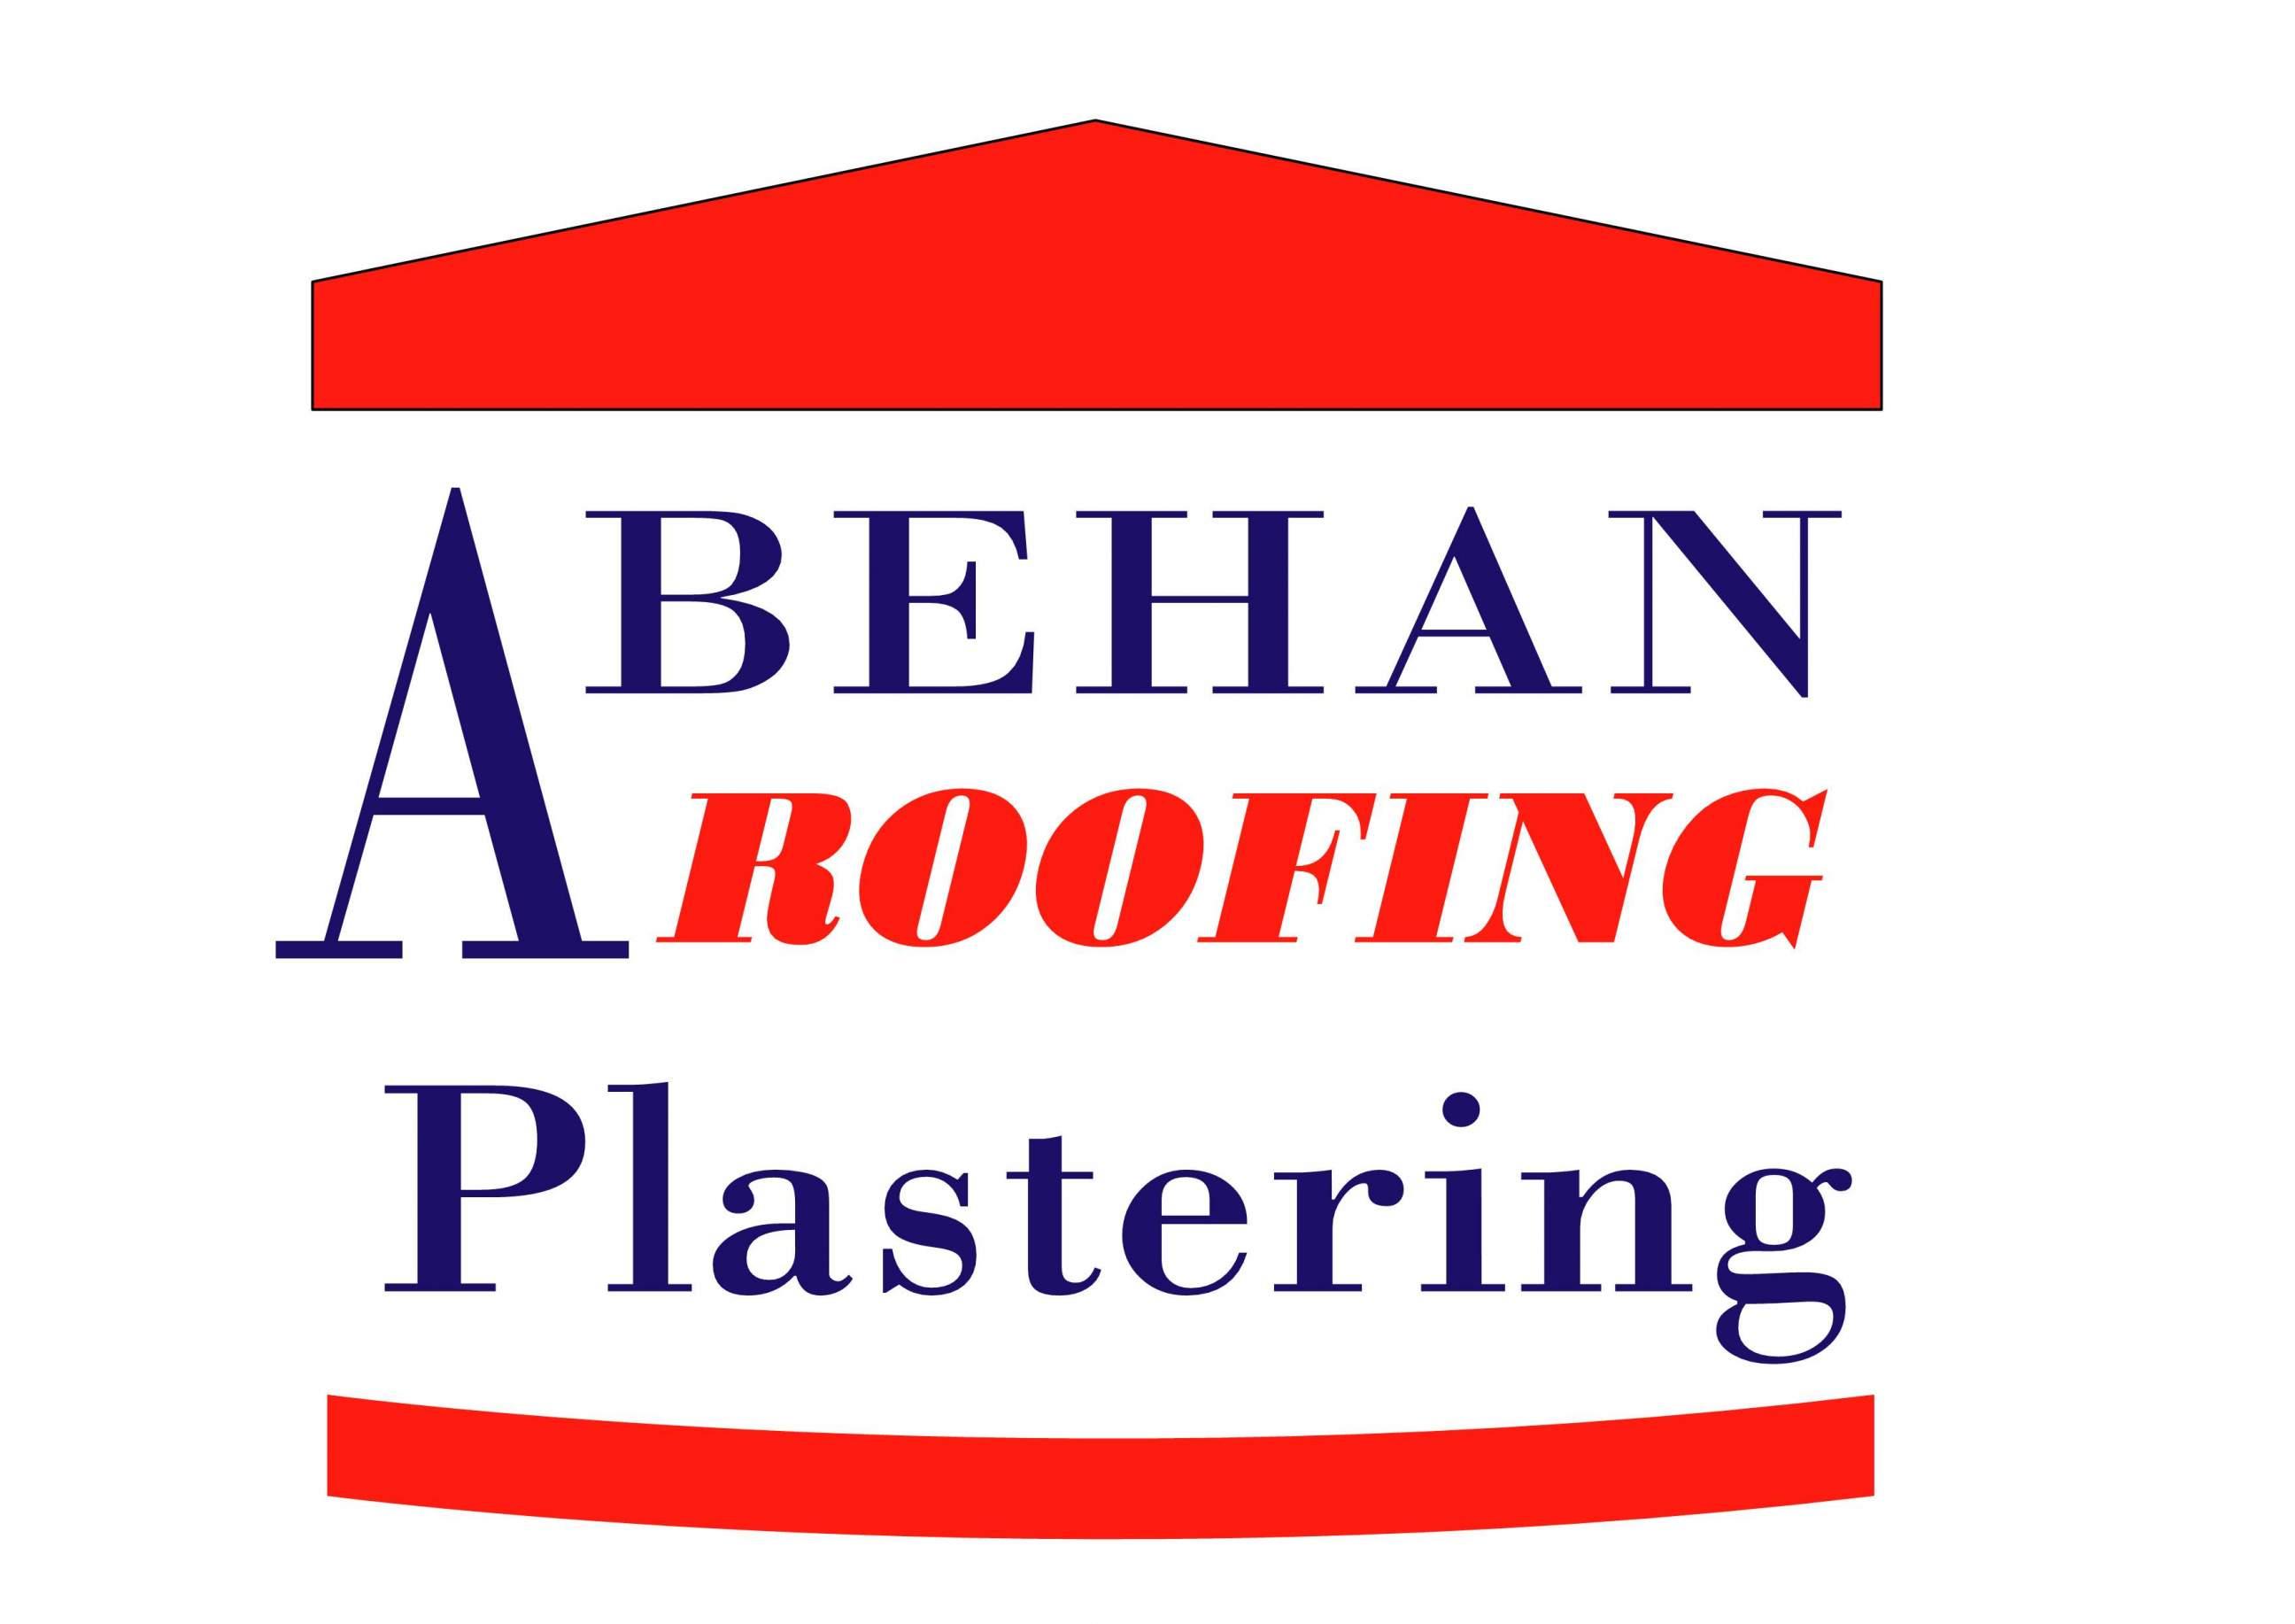 Alan Behan Plastering